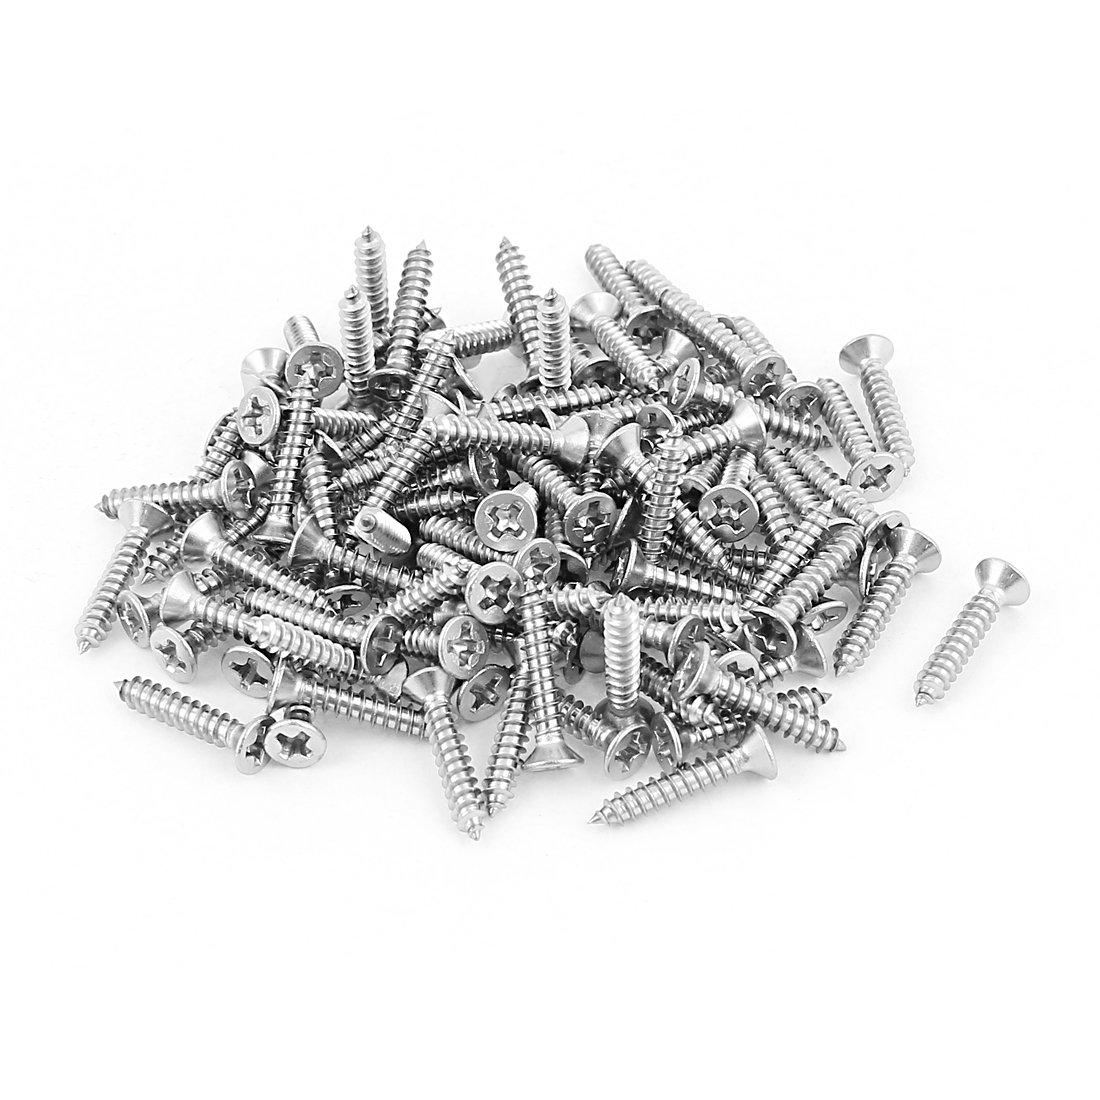 M 3 x 16 mm Phillips cabeza plana de acero inoxidable tornillos rosca chapa 100 piezas Sourcingmap a15062900ux0077